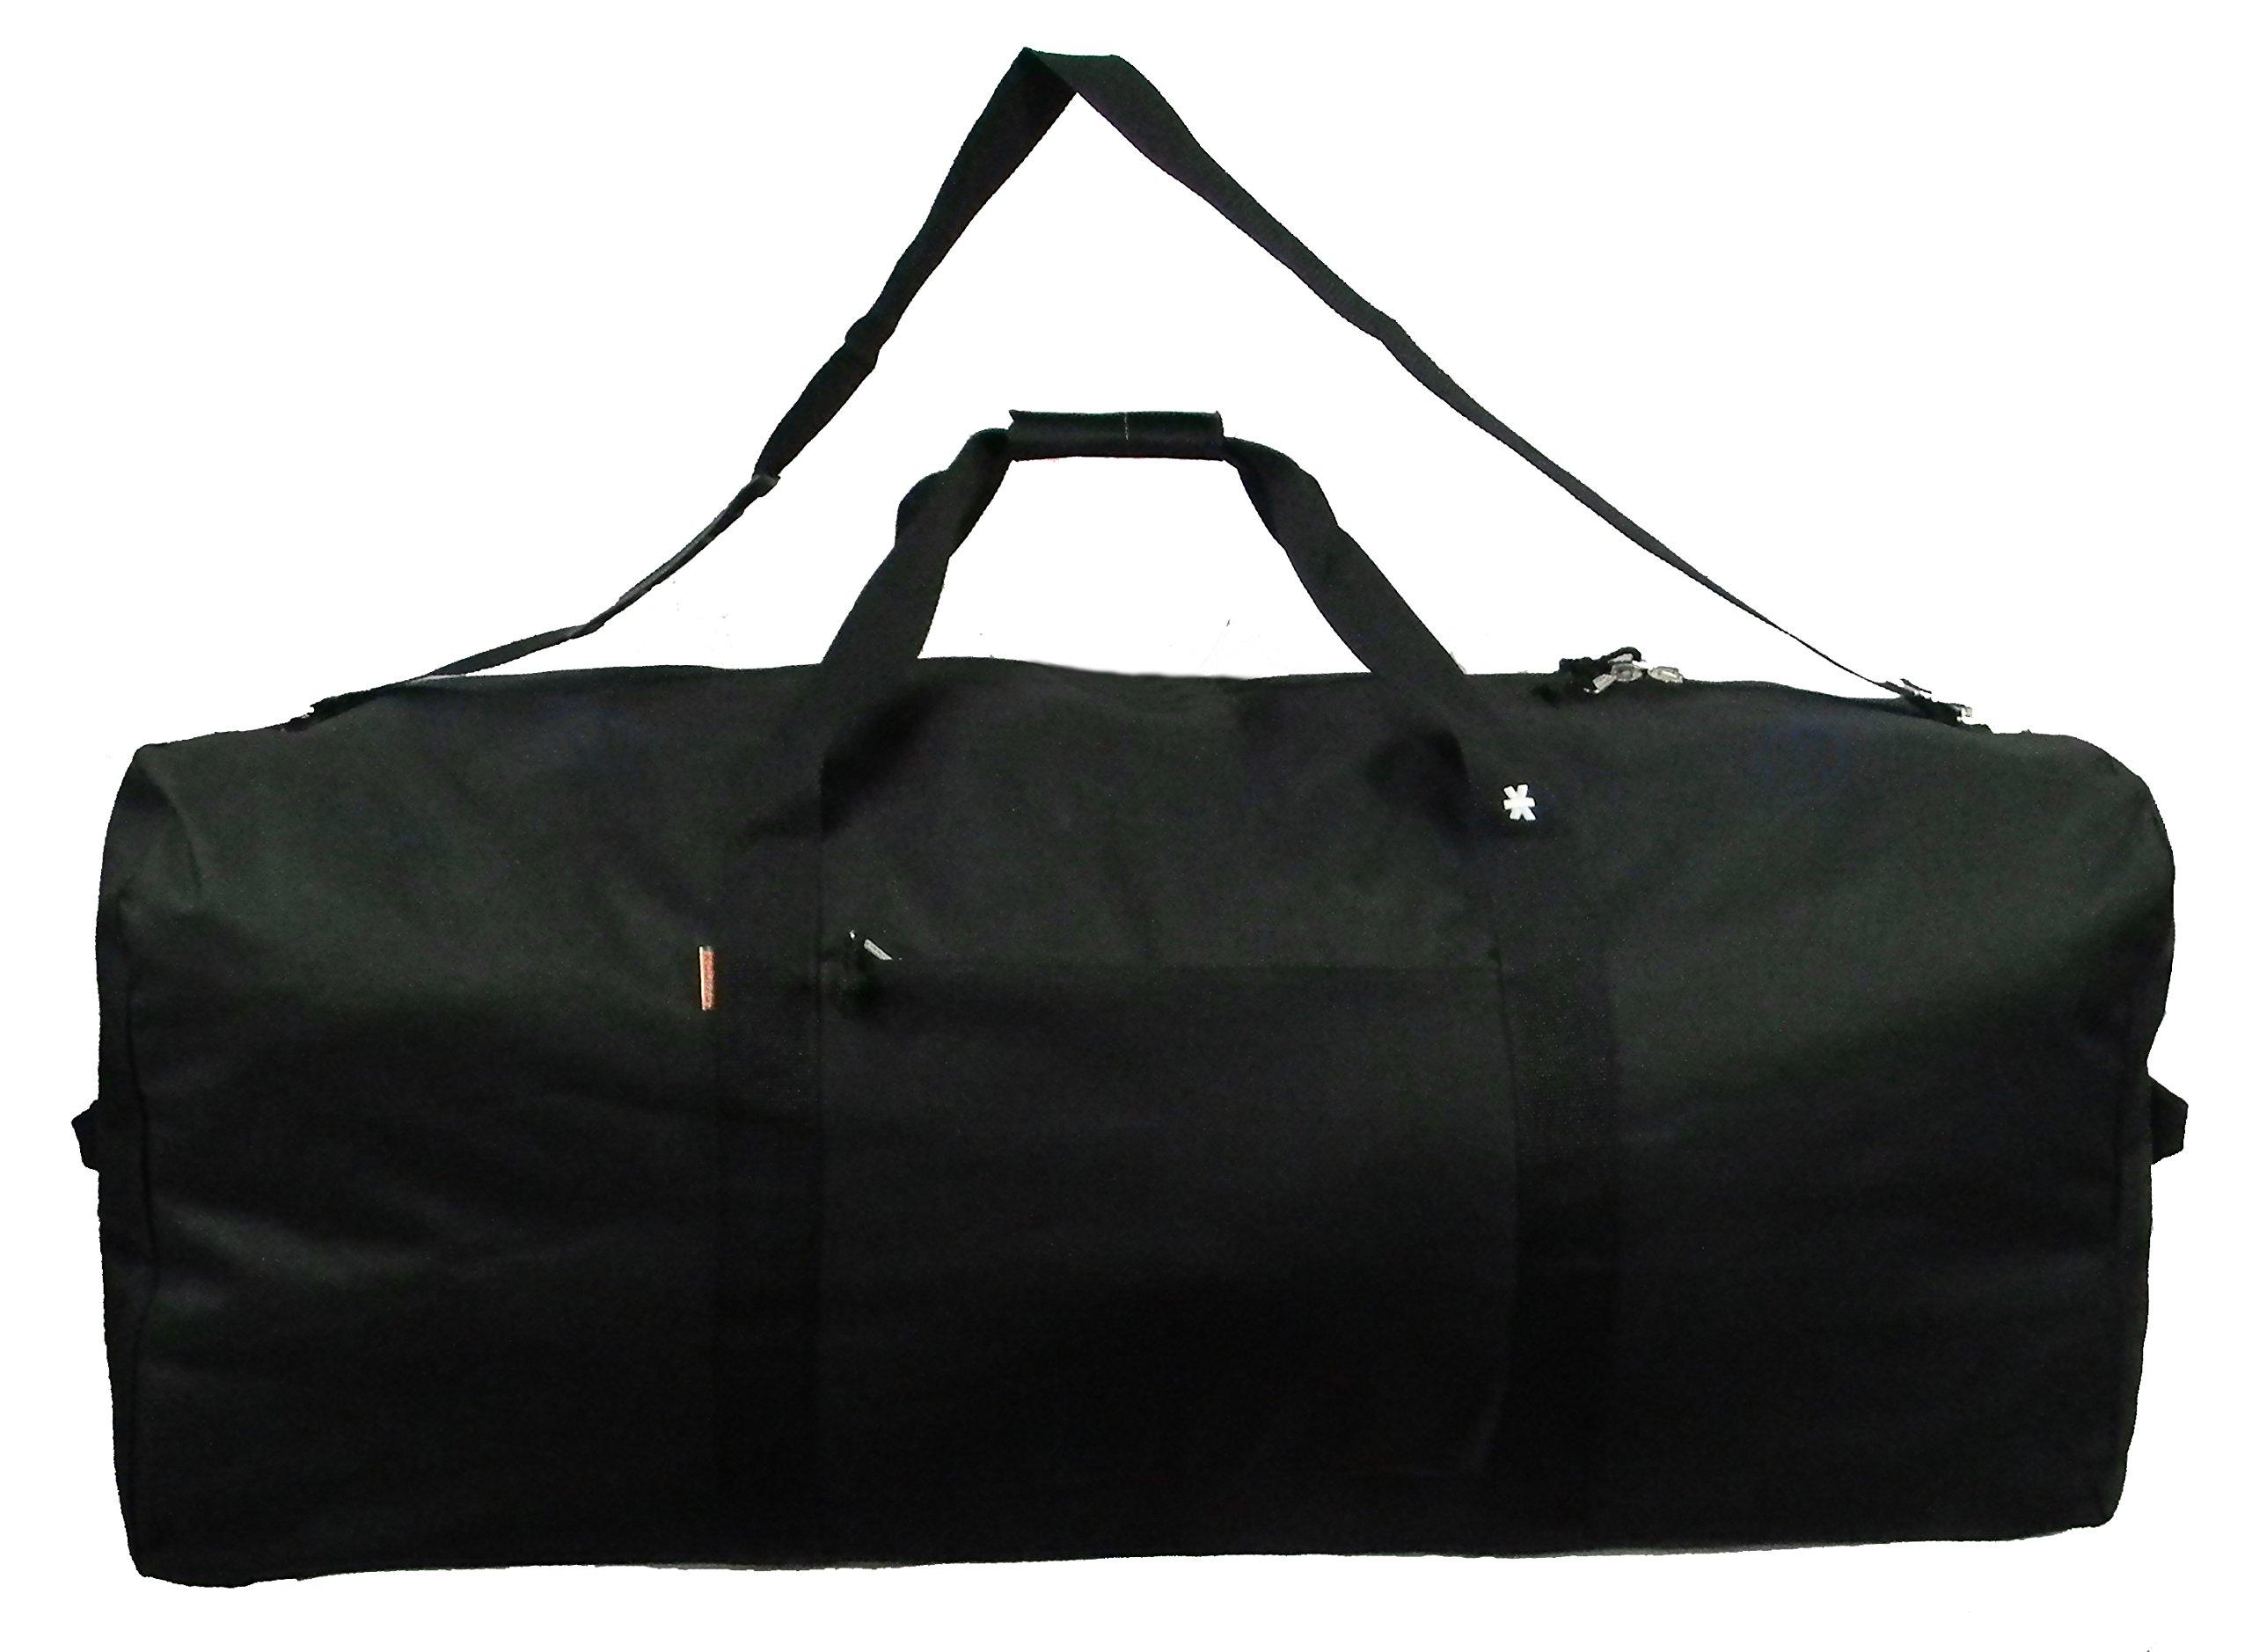 Heavy Duty Cargo Duffel Large Sport Gear Drum Set Equipment Hardware Travel Bag Rooftop Rack Bag 36 Inch Black Medium Traveling Bags